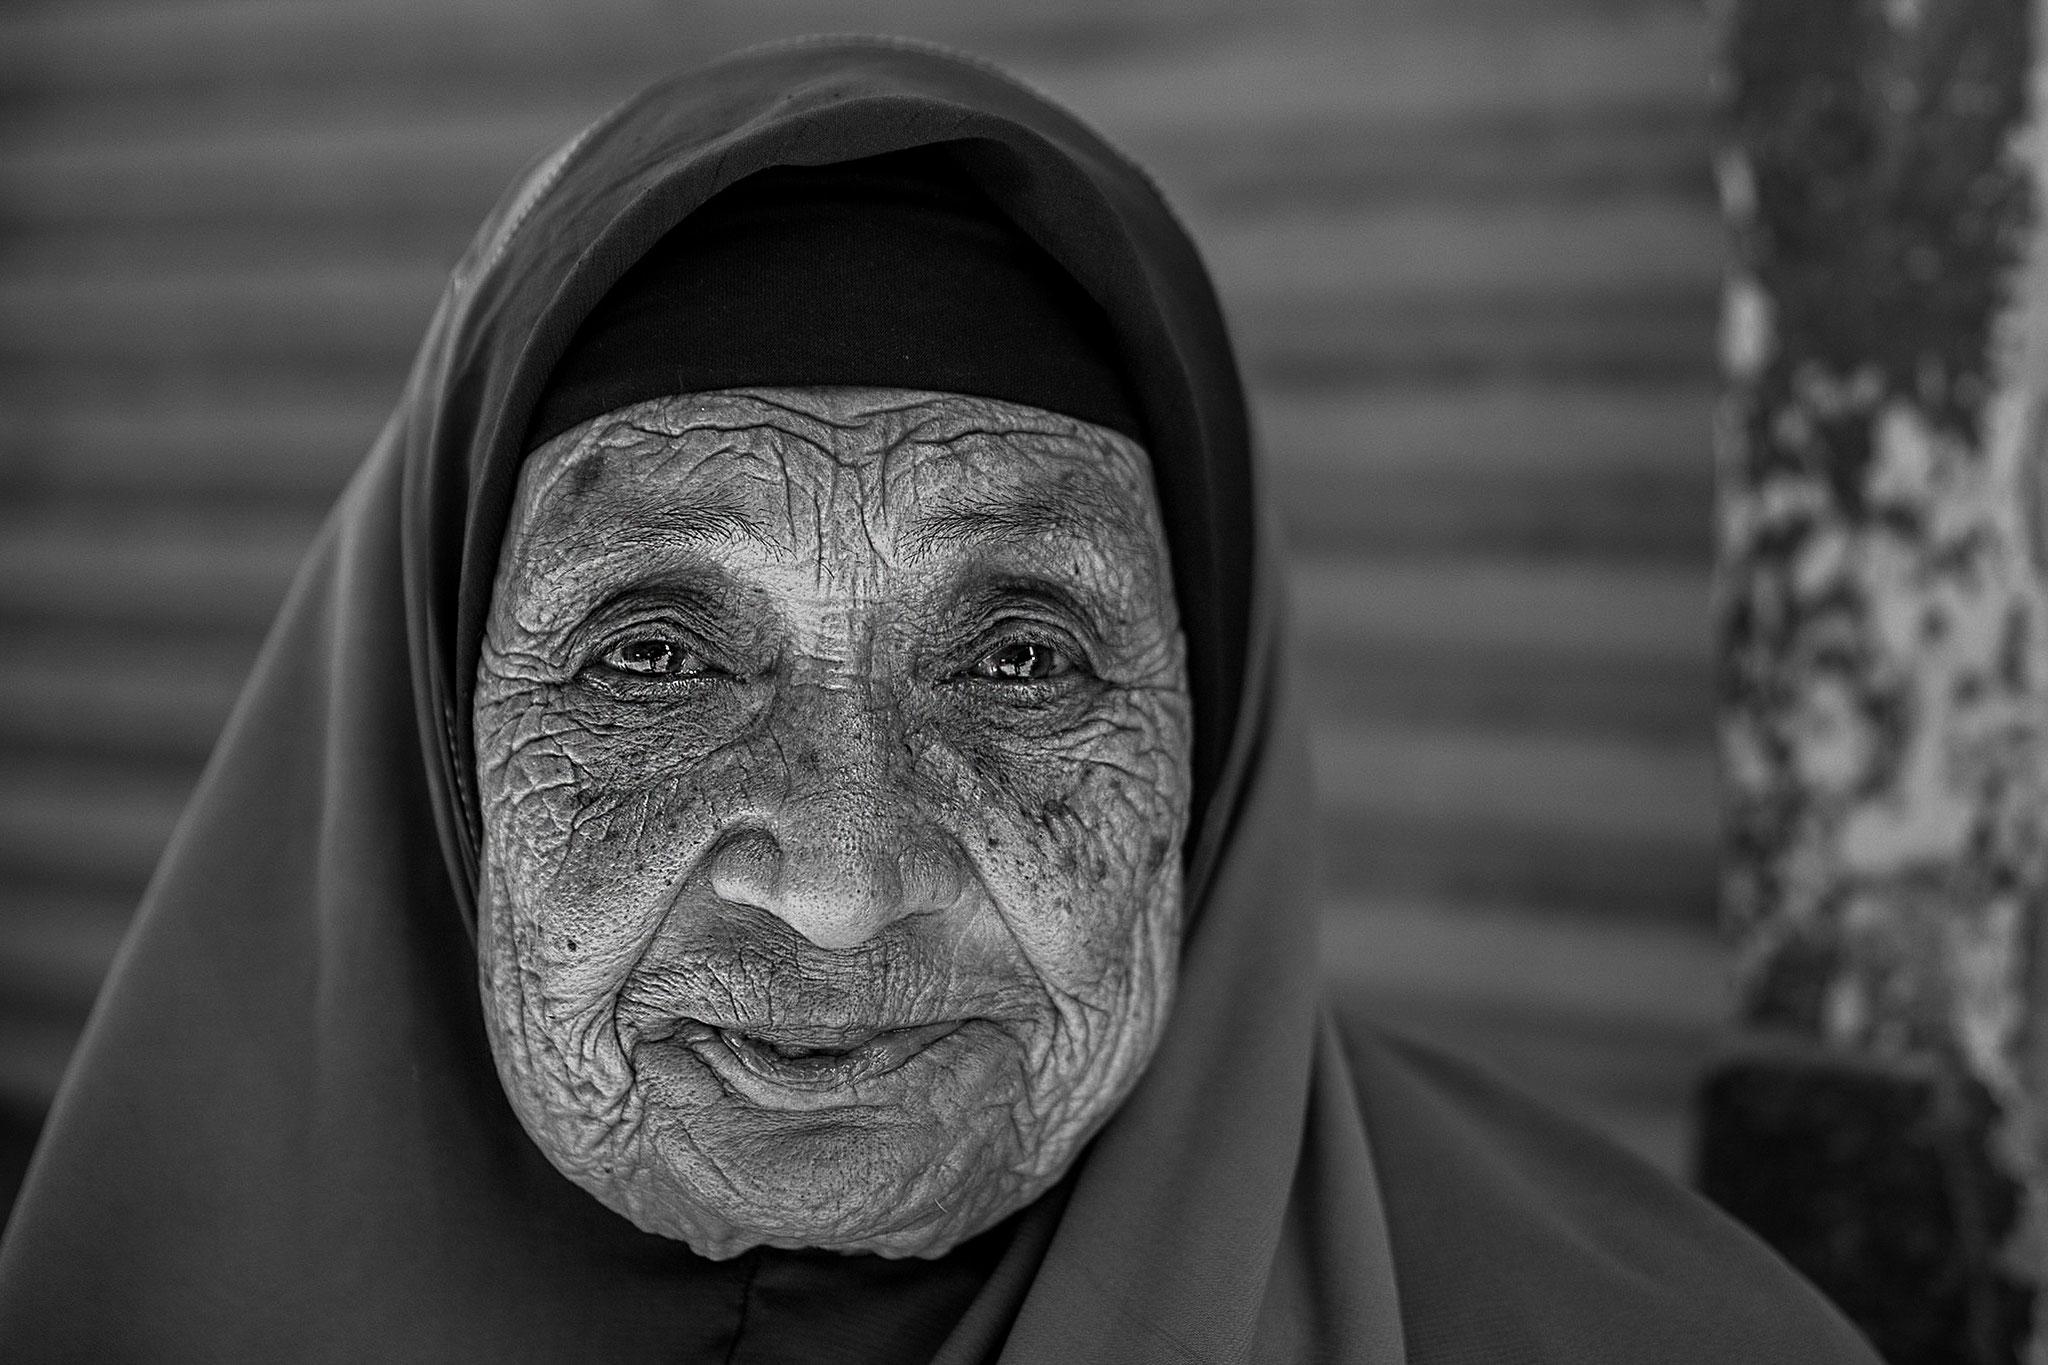 Ahmed Abdel Hamid AFIAP (Egypt) - Motherhood